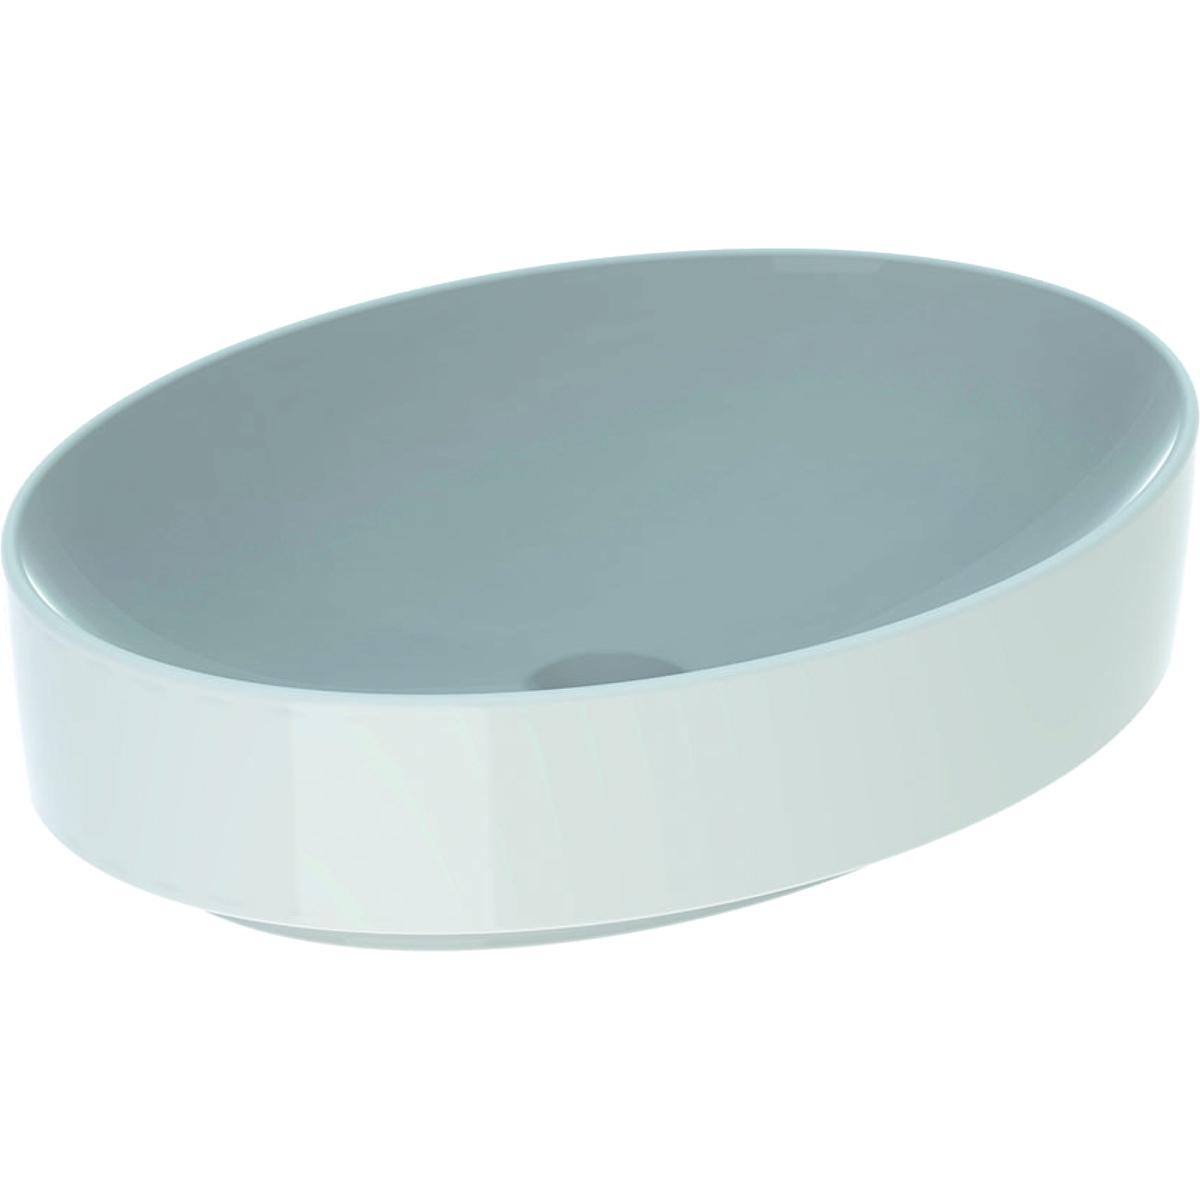 Lavoar oval tip bol Geberit VariForm 55x40cm fara orificiu baterie fara preaplin alb imagine